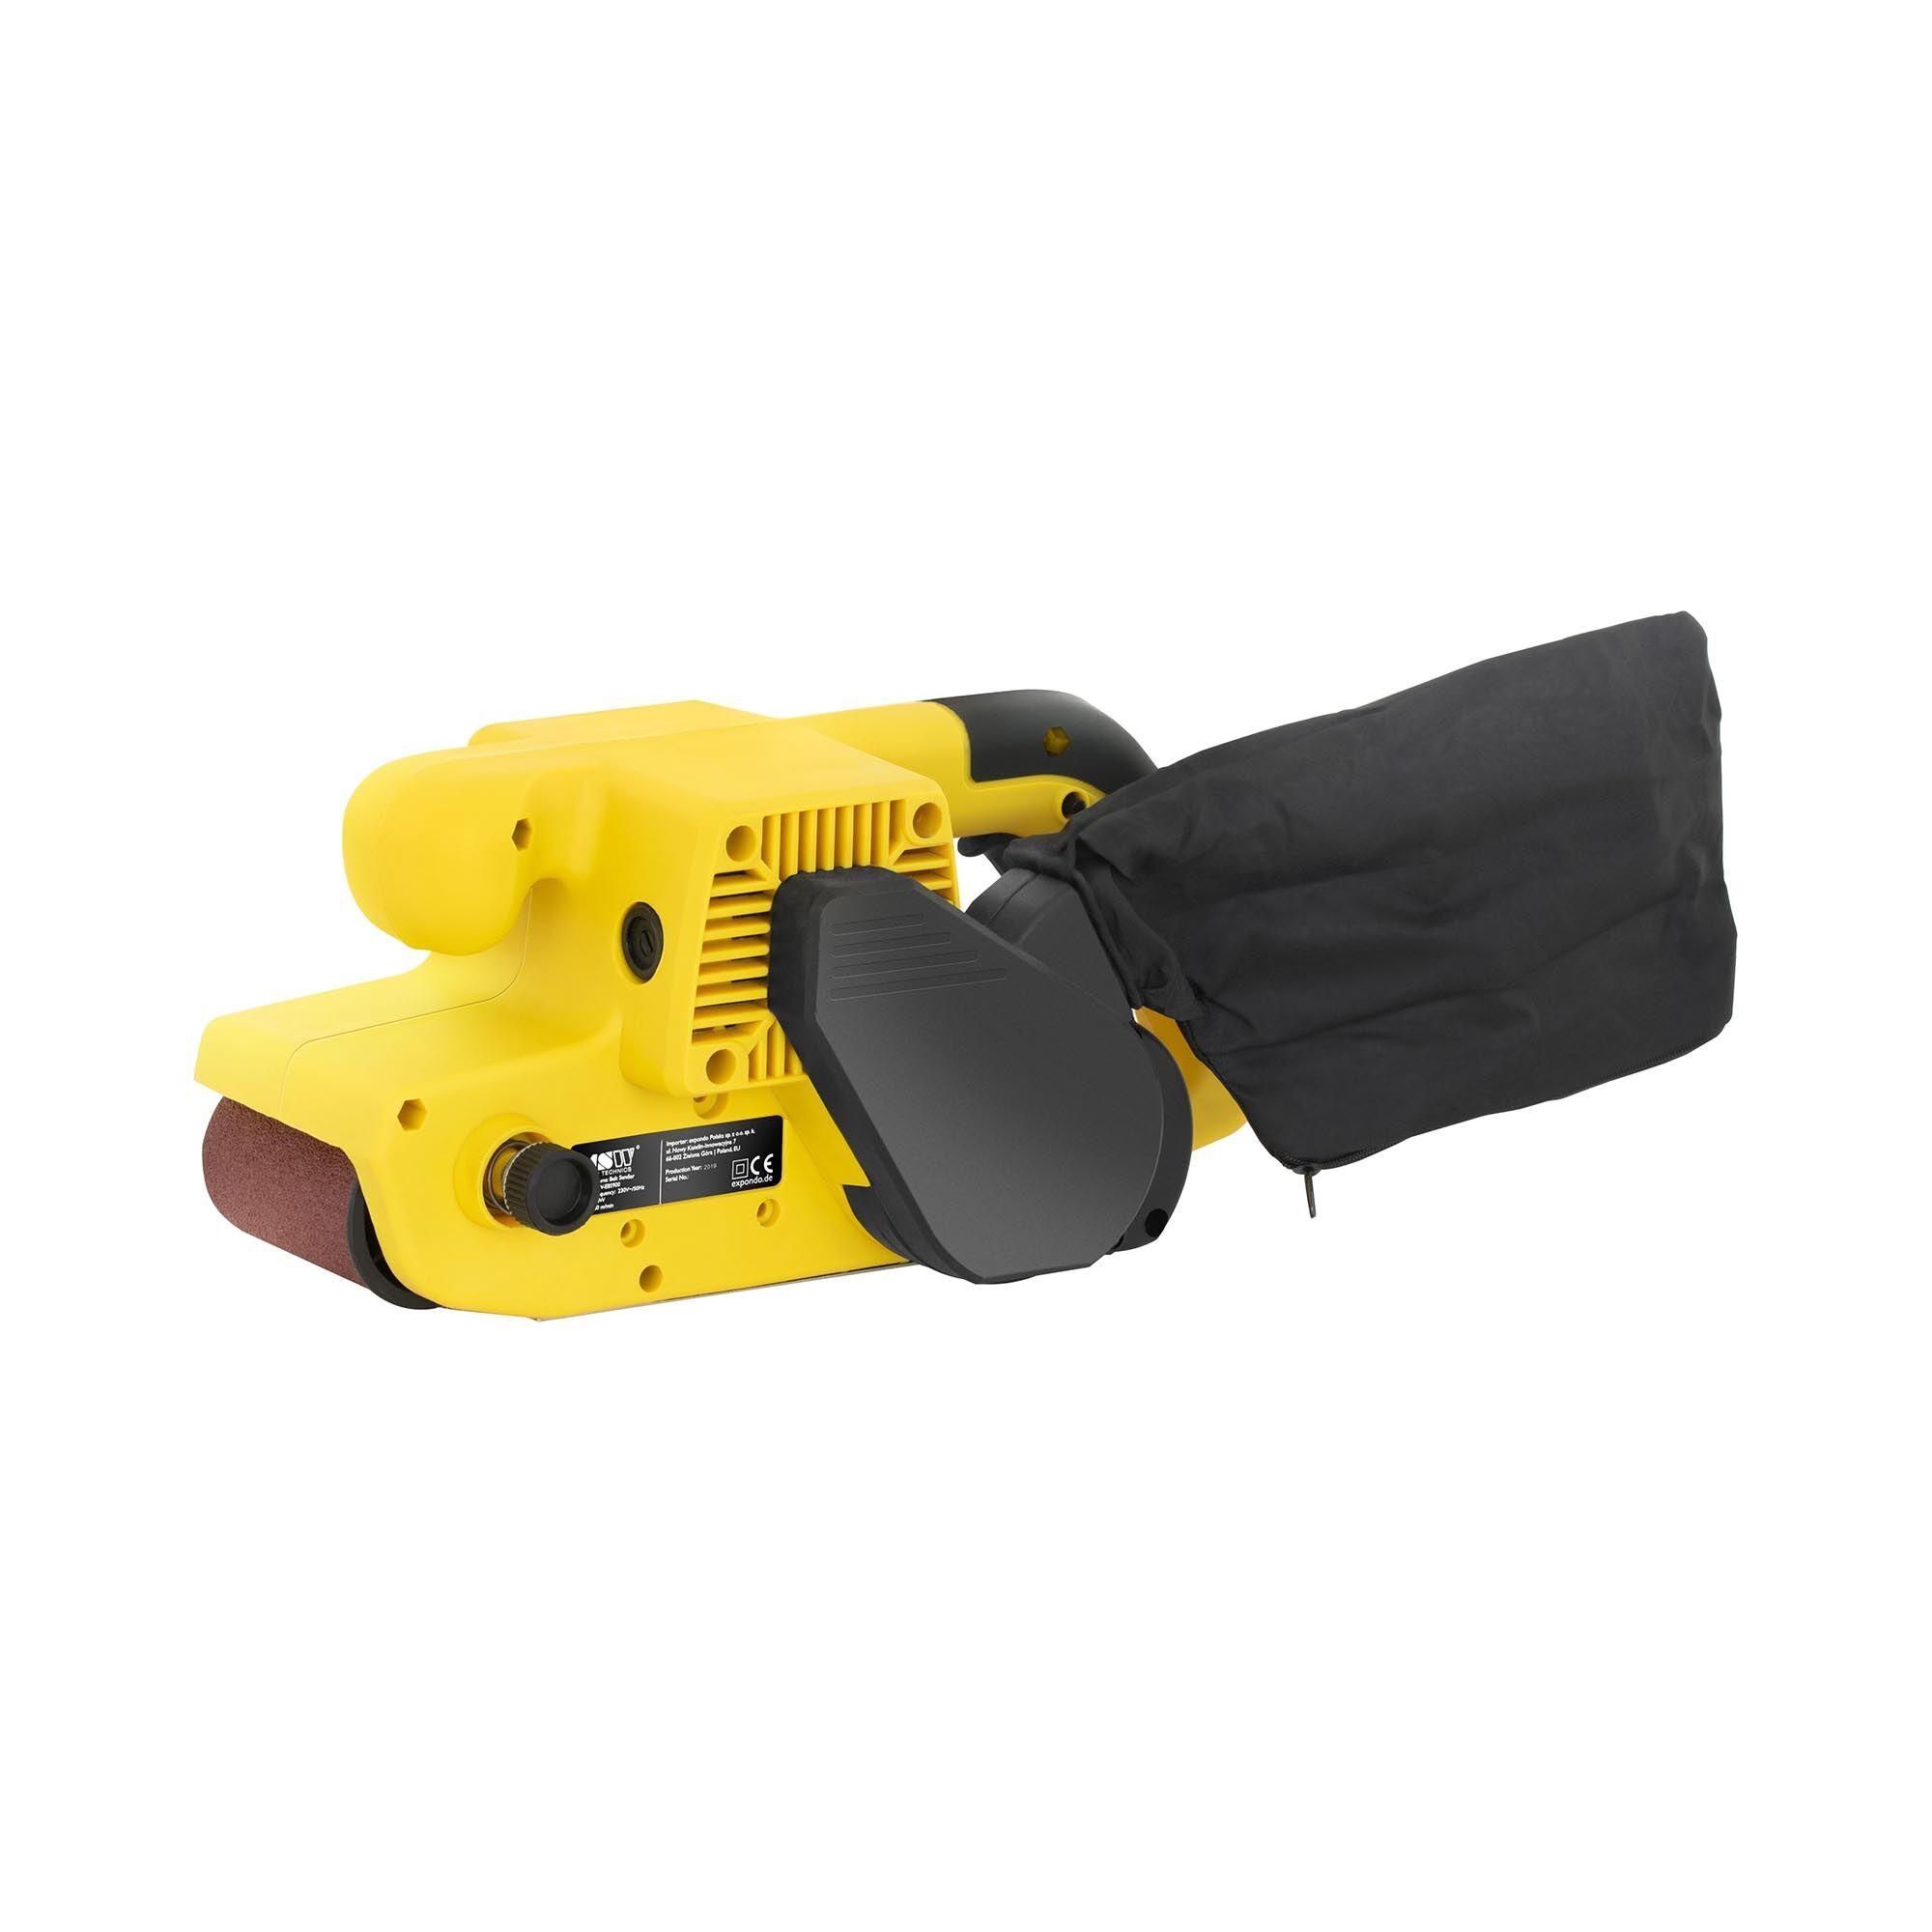 MSW Ponceuse à bande manuelle - 900 W MSW-EBS900